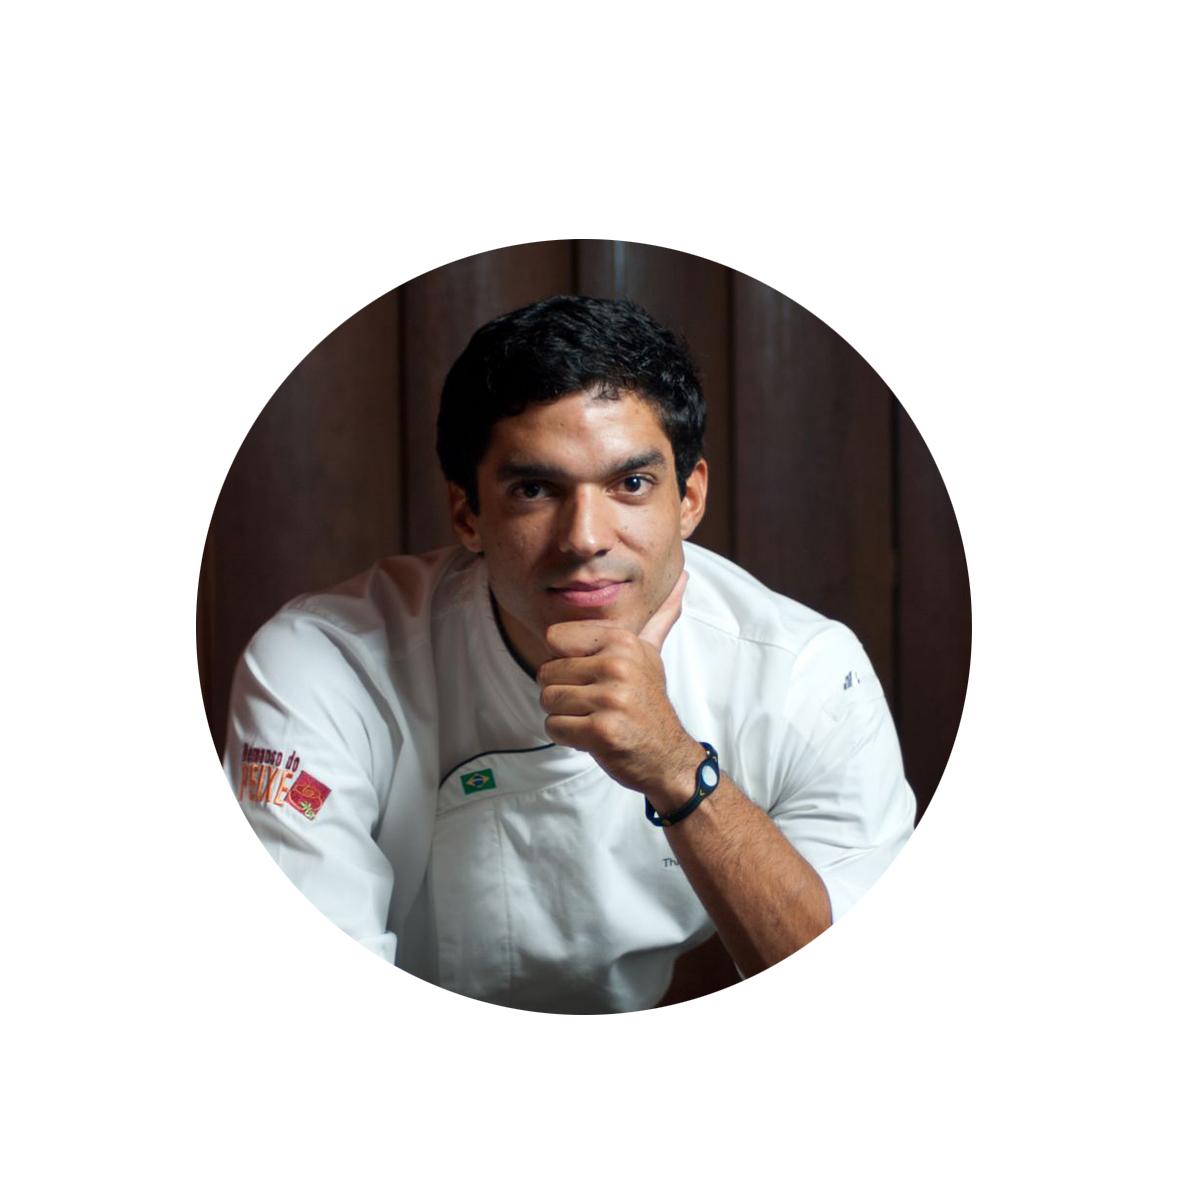 T HIAGO CASTANHO - Brasil - Chef especializado en cocina de origen amazónico  50 best restaurants Latin America